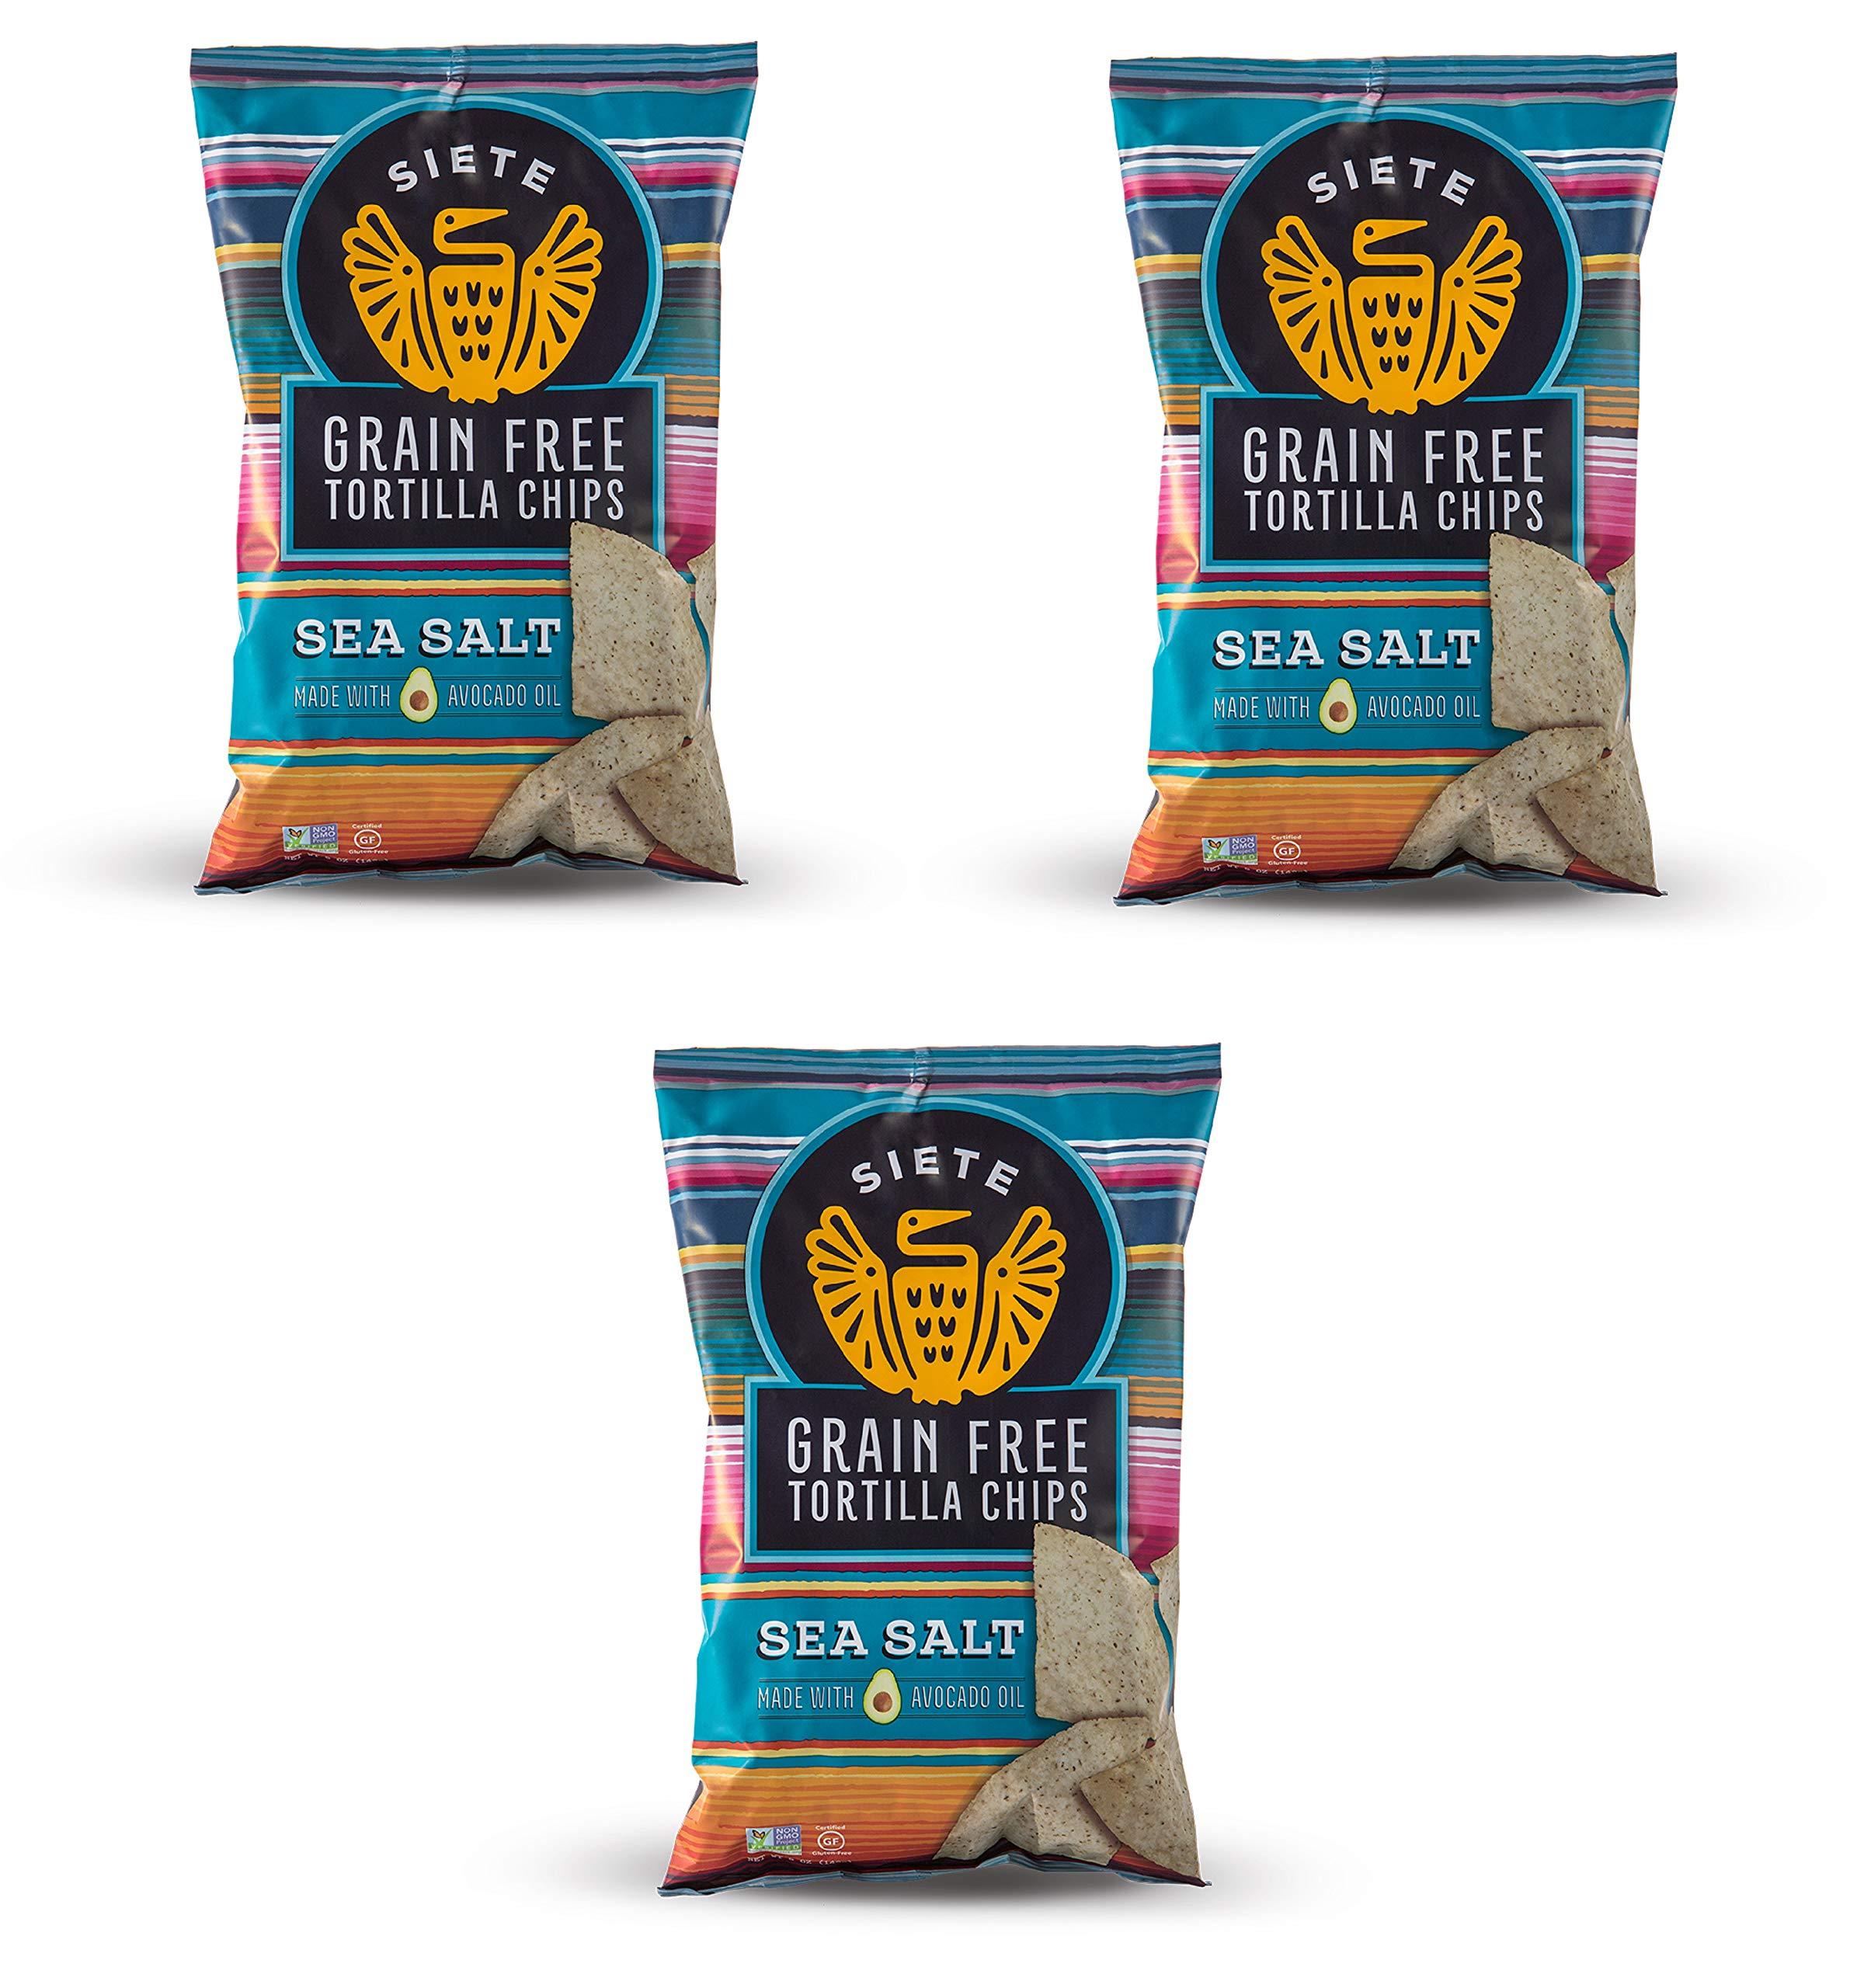 Siete Sea Salt Grain Free Tortilla Chips, 5 oz bags, 3-Pack by Siete